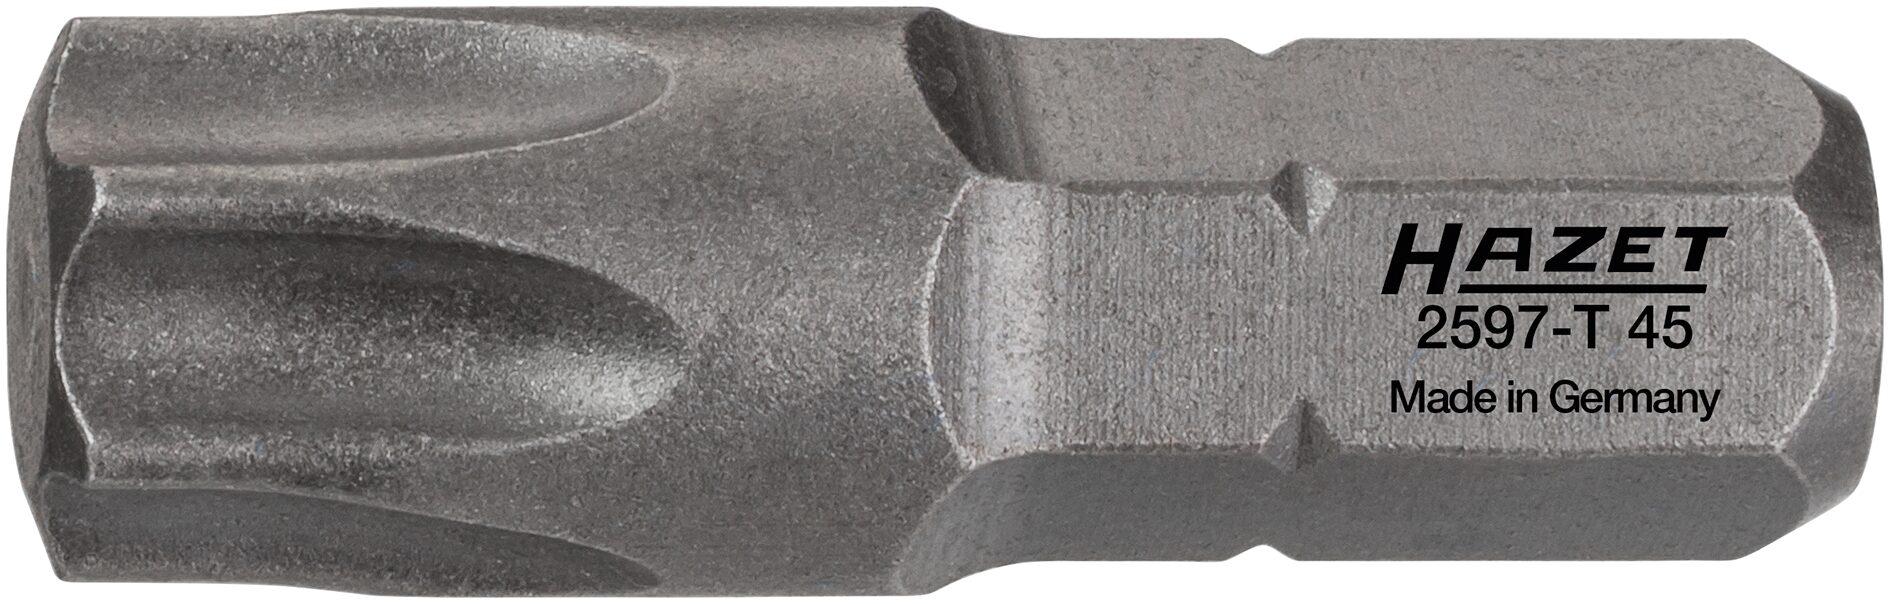 HAZET Bit 2597-T45 ∙ Sechskant massiv 6,3 (1/4 Zoll) ∙ Innen TORX® Profil ∙ T45